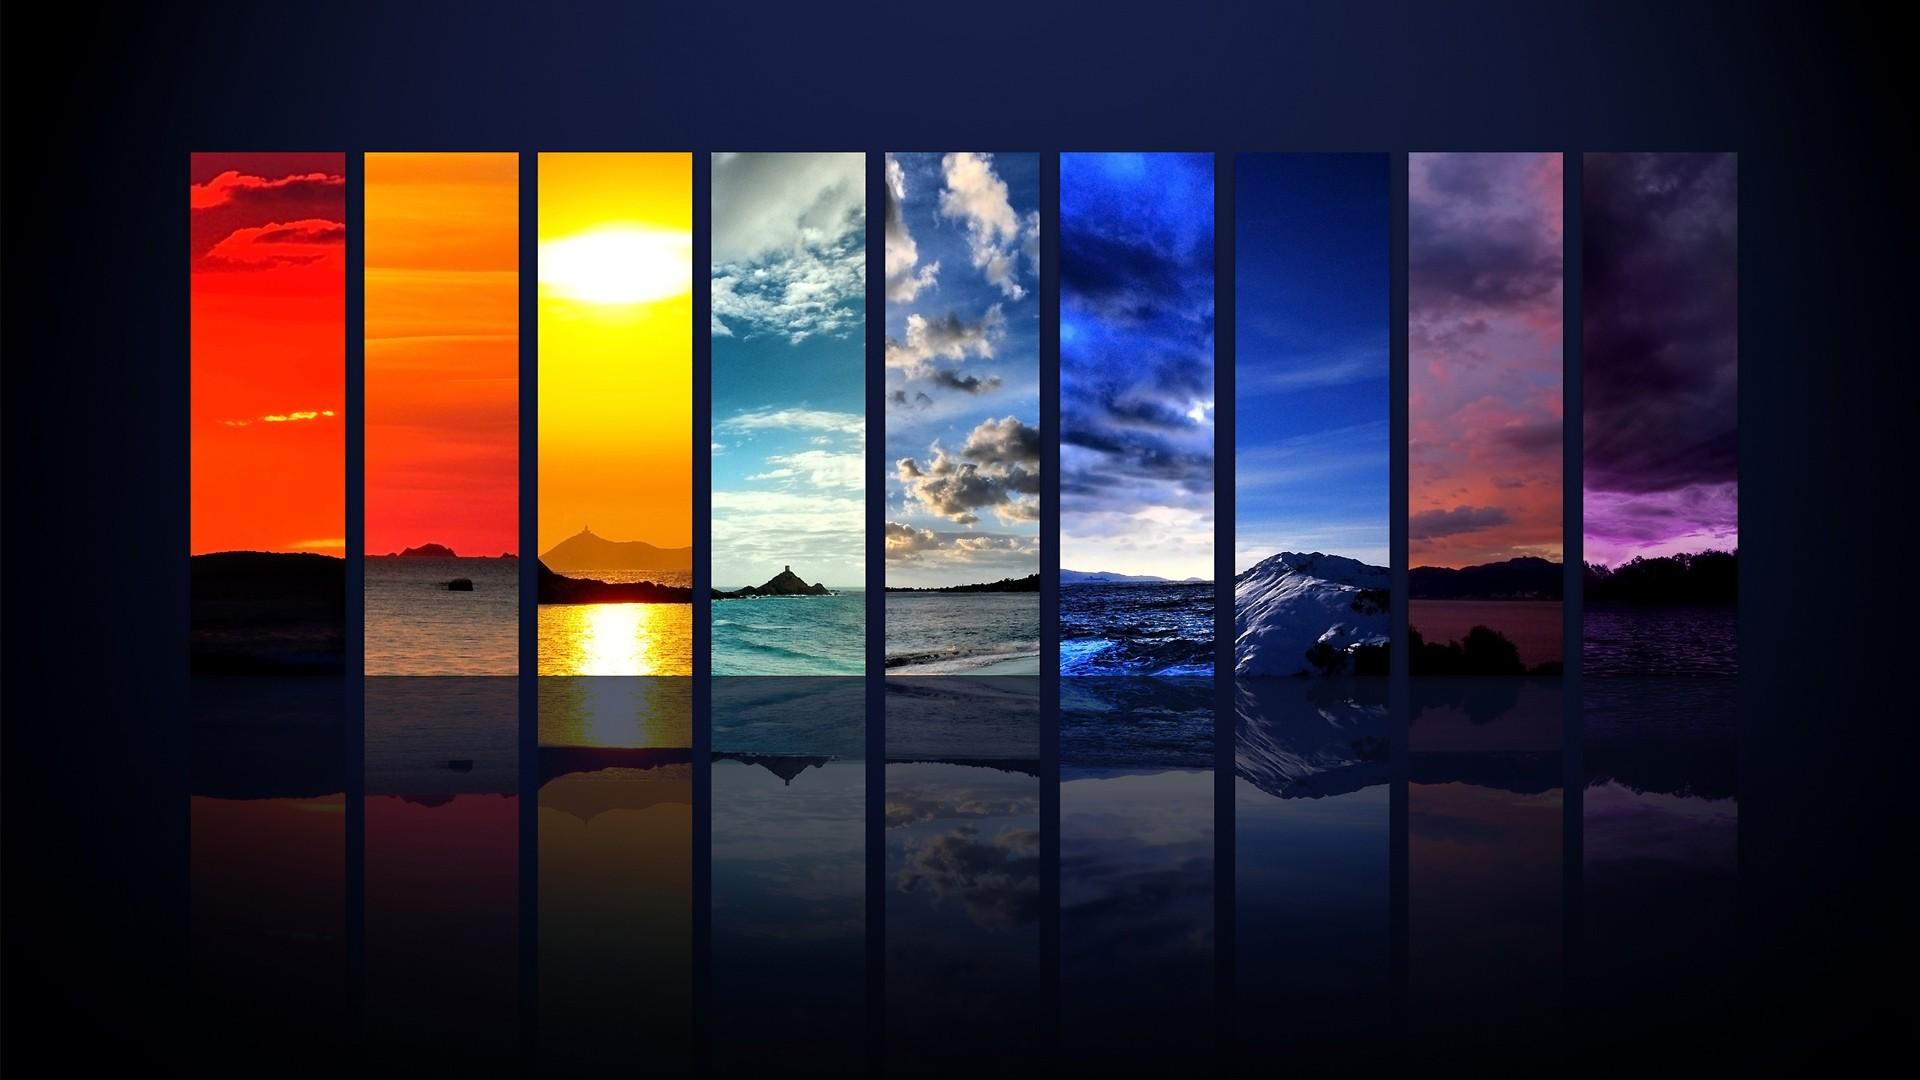 1360 X 768 Desktop Wallpaper (60+ images)